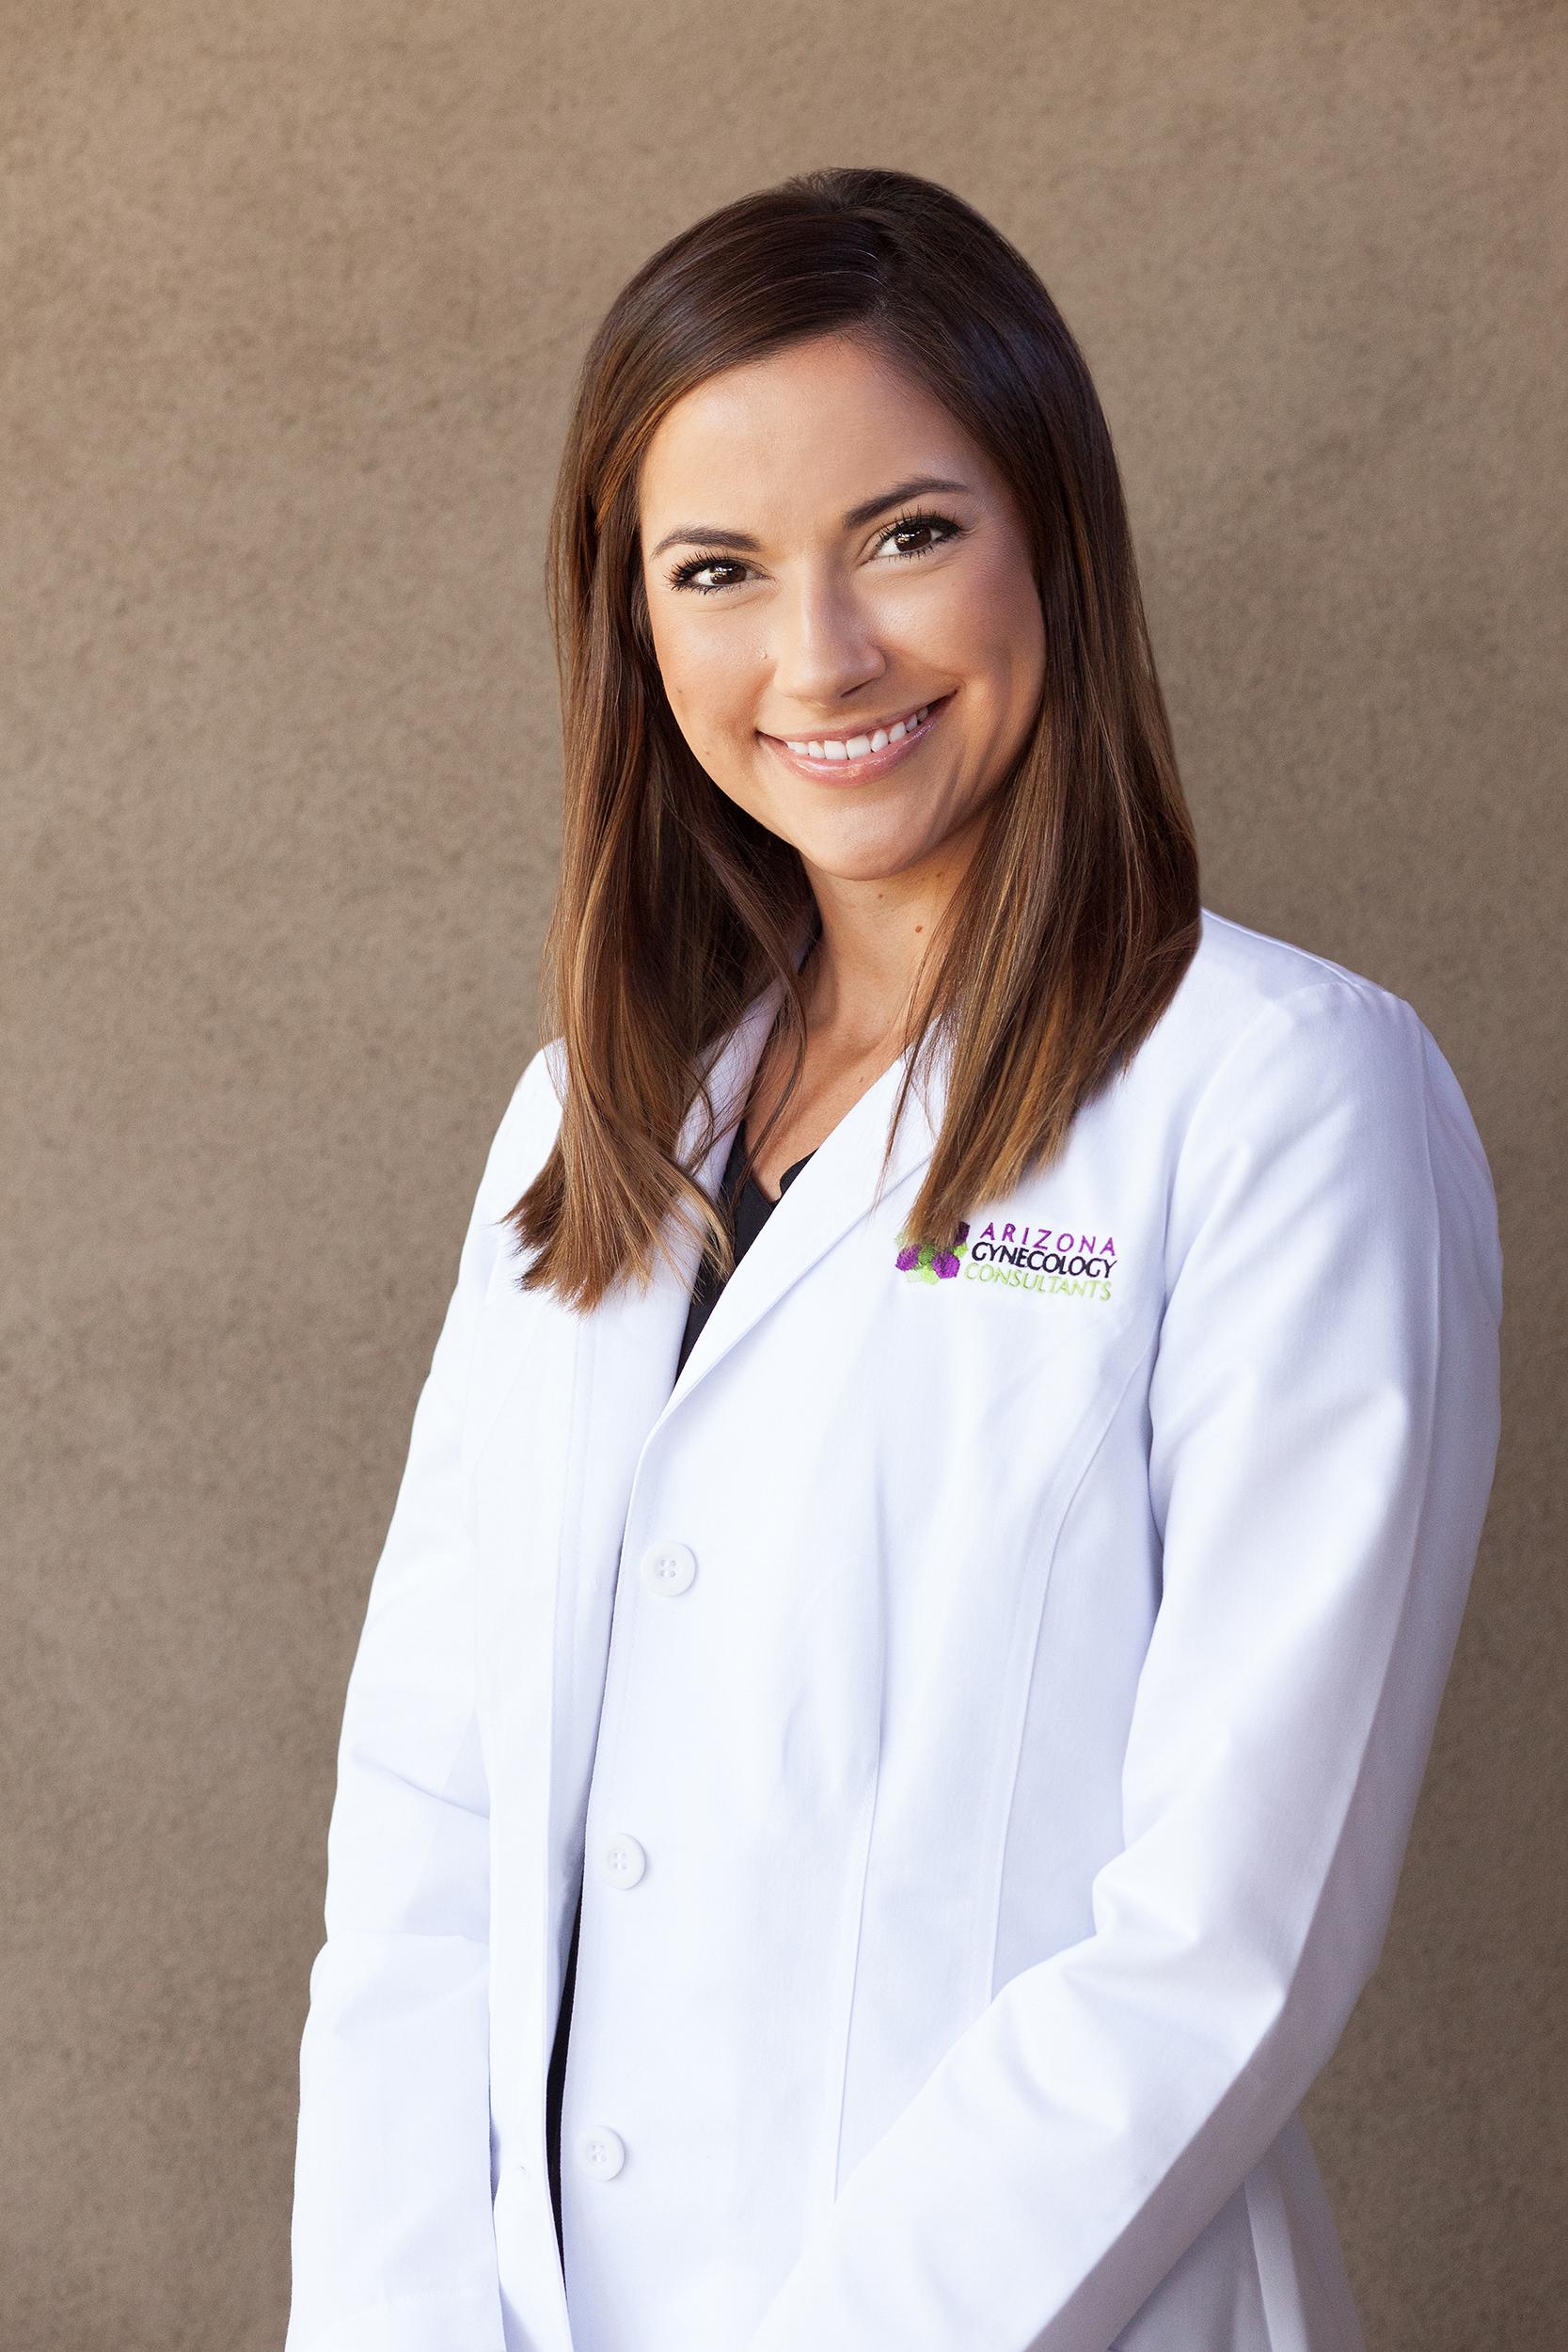 WEB_Arizona Gynecology Consultants_Cyr_1697.jpg